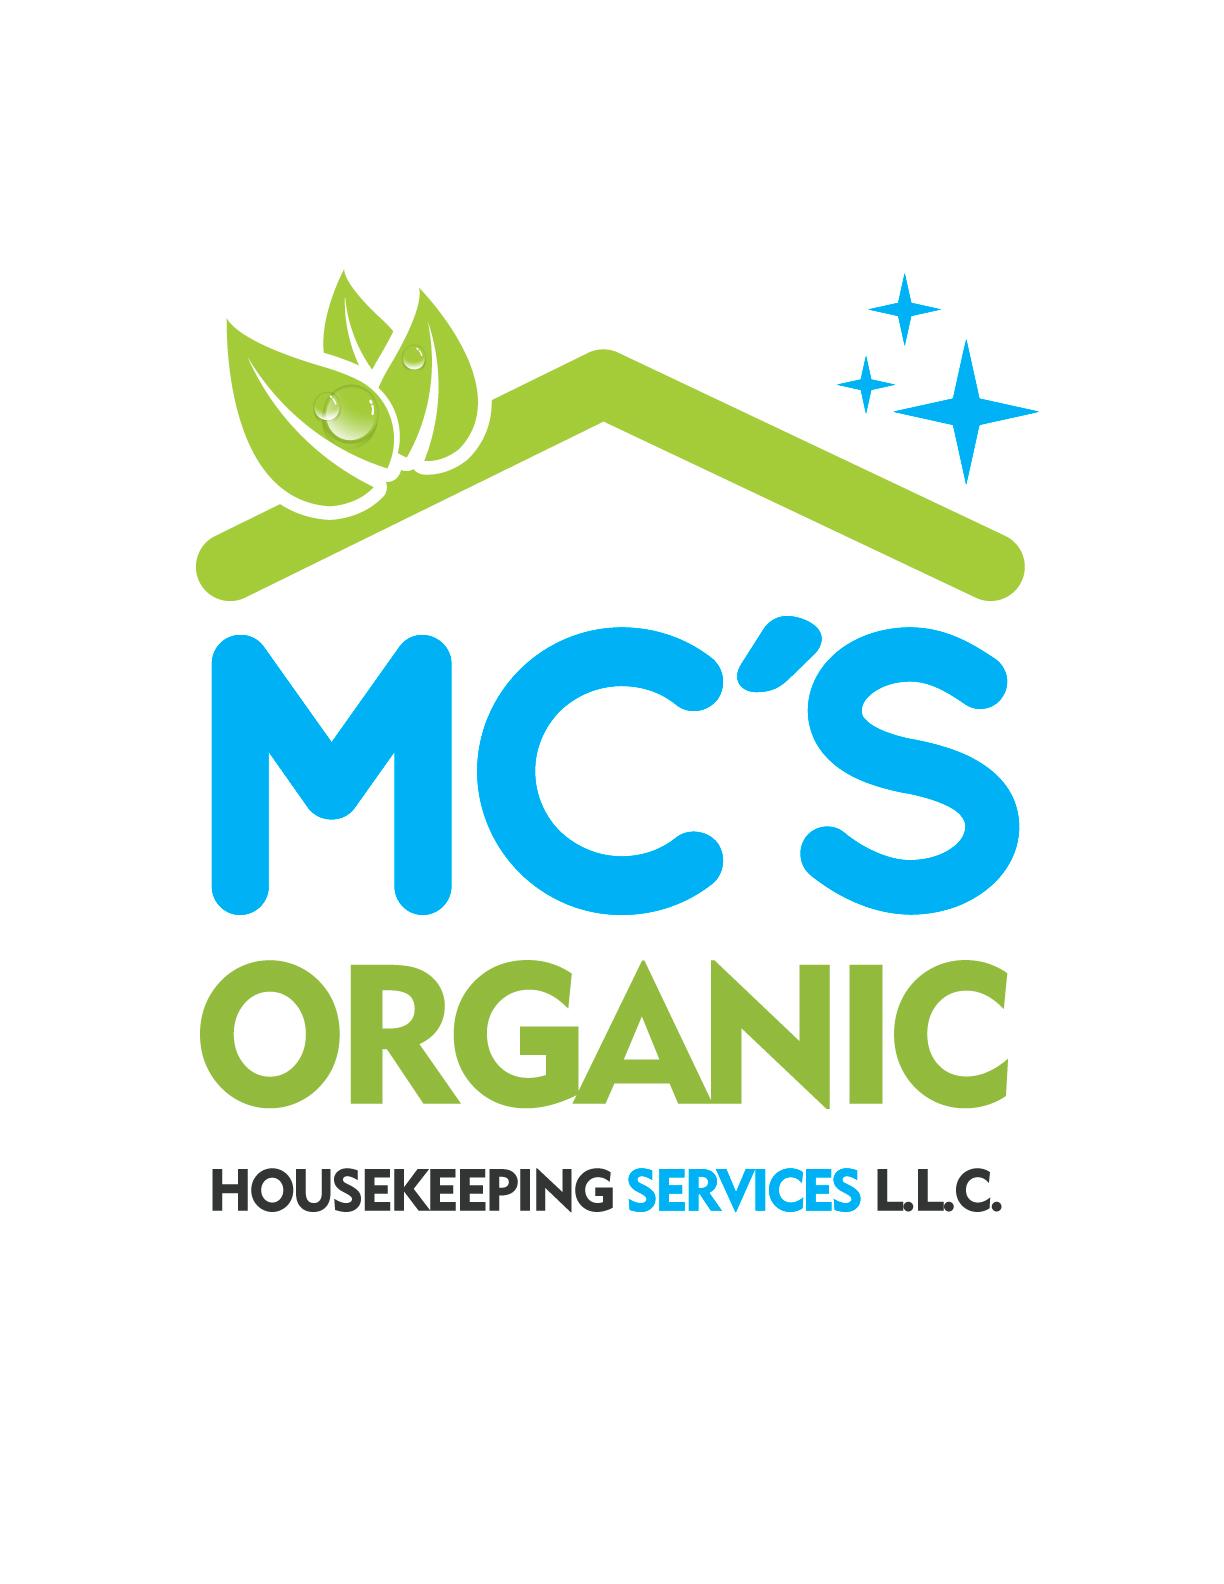 MC's Organic Housekeeping Services LLC logo